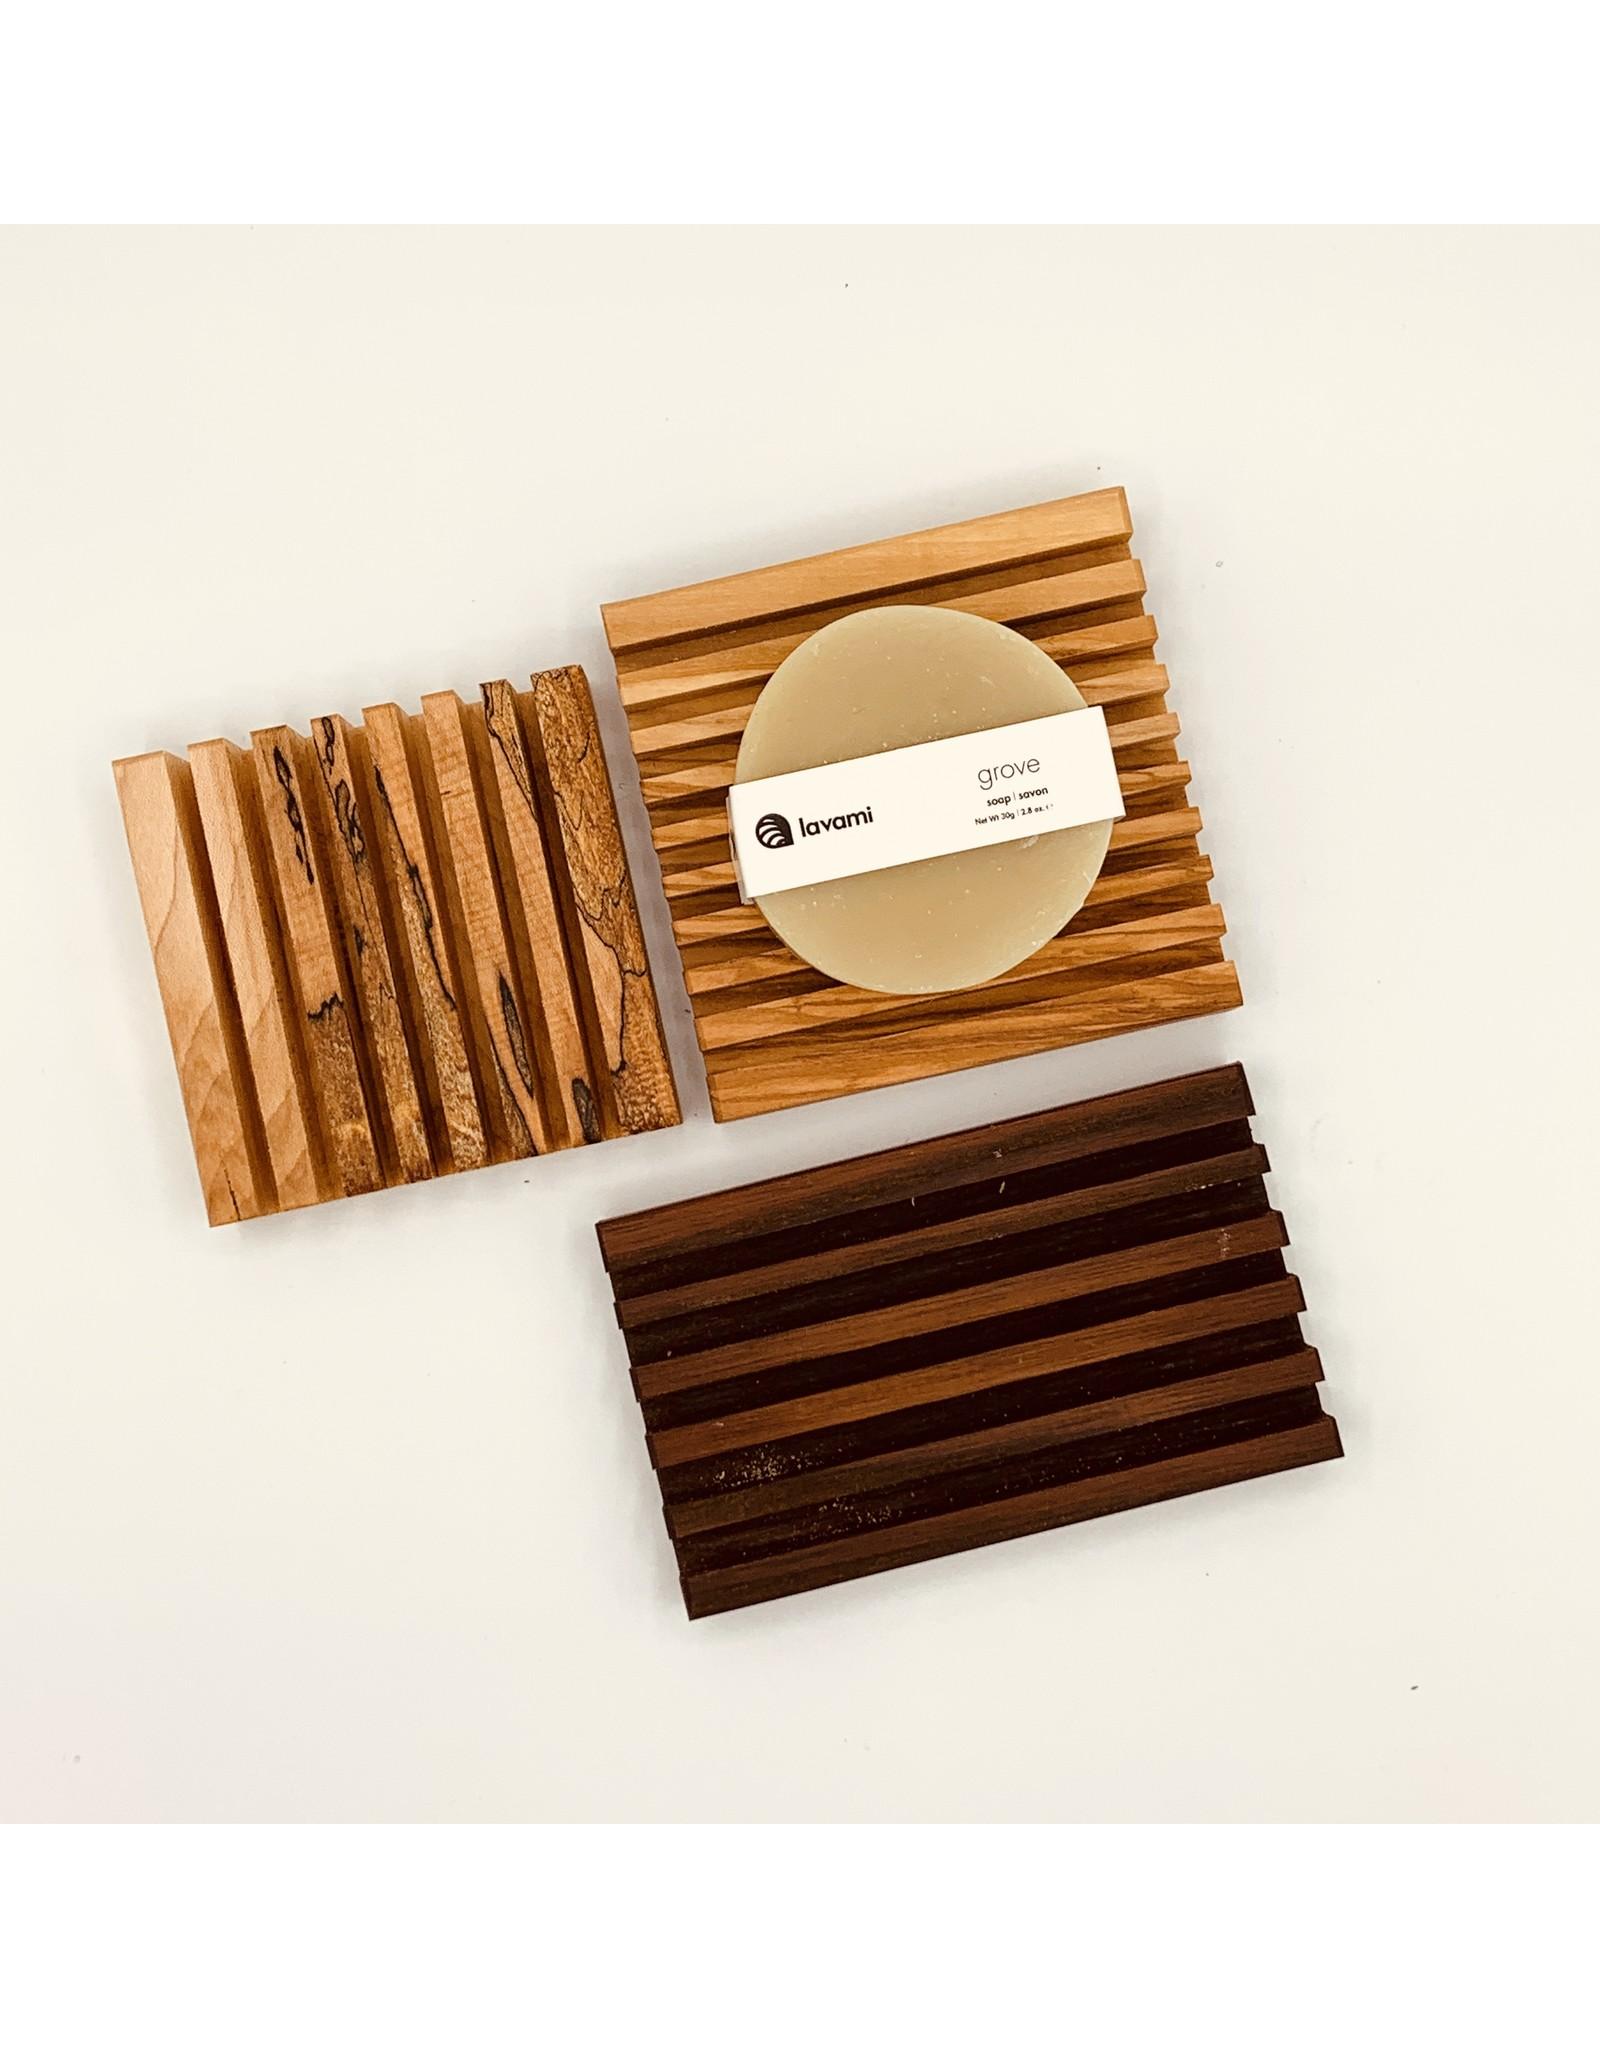 EcoFillosophy Wooden Soap Dish